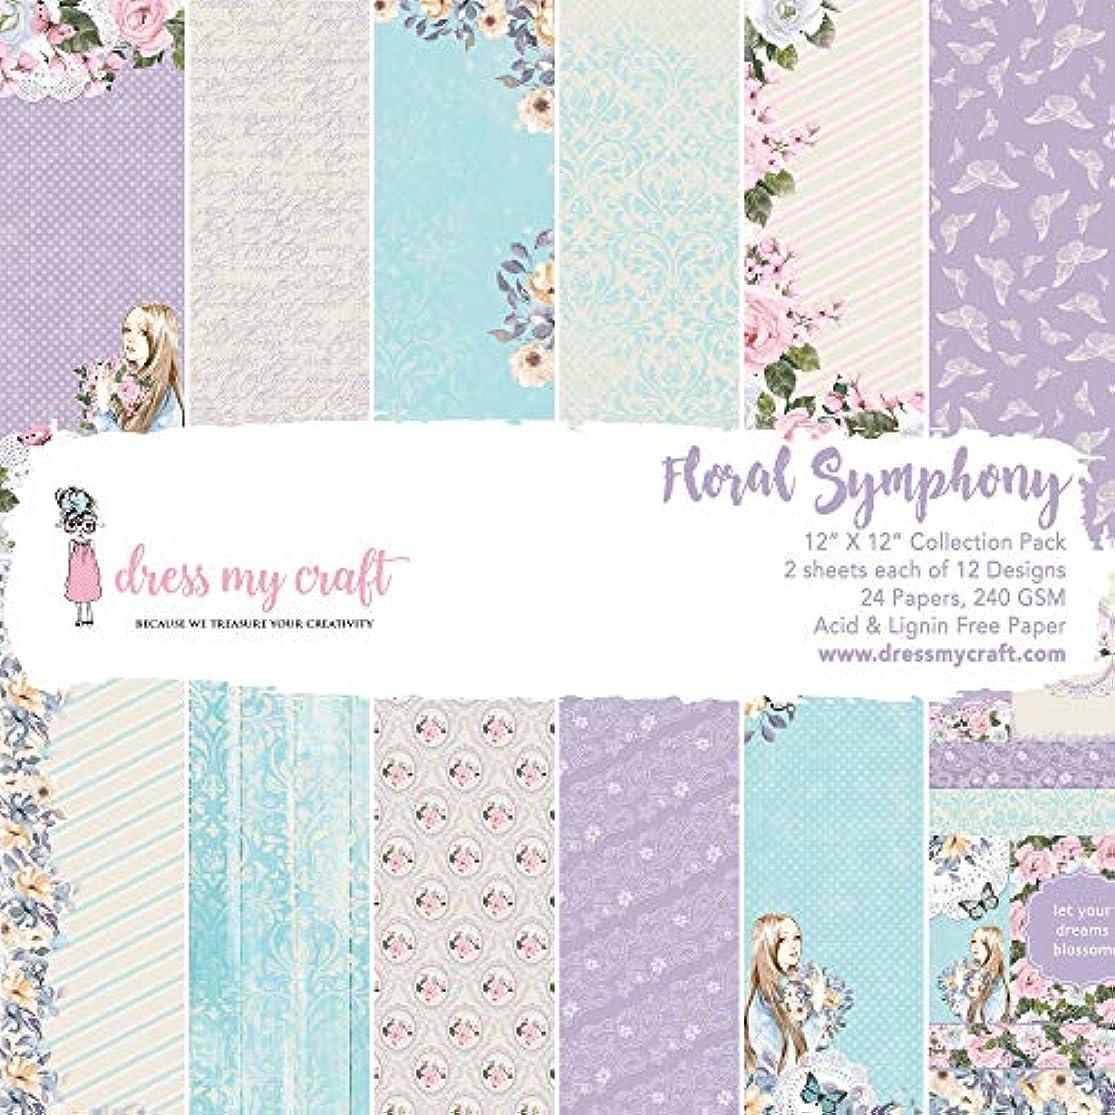 Dress My Craft Single-Sided Paper Pad 12